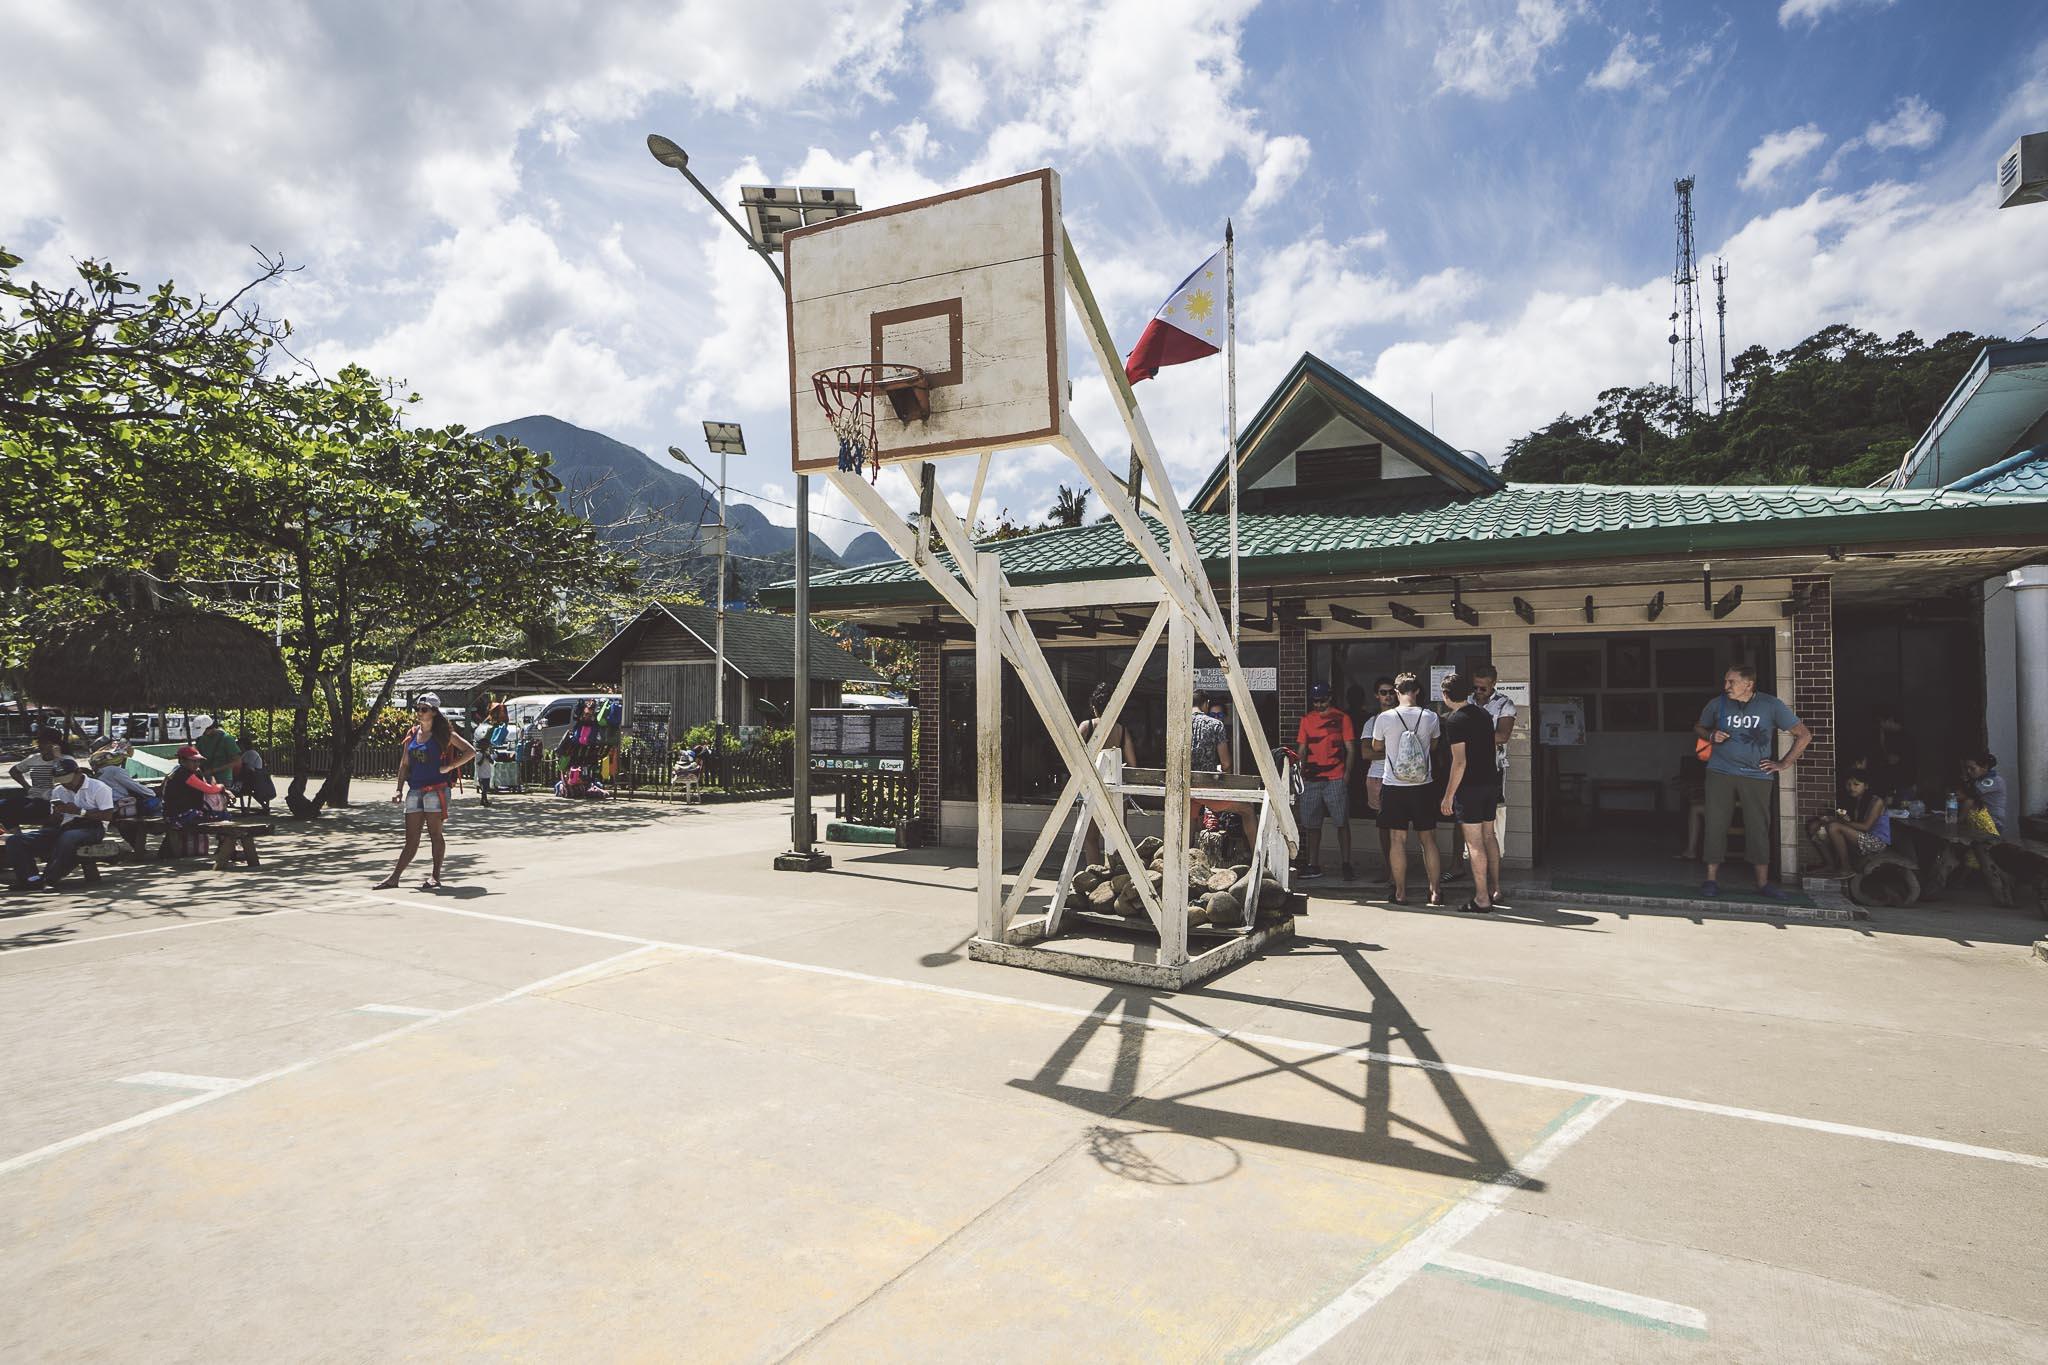 Filipiny, Palawan, koszykówka